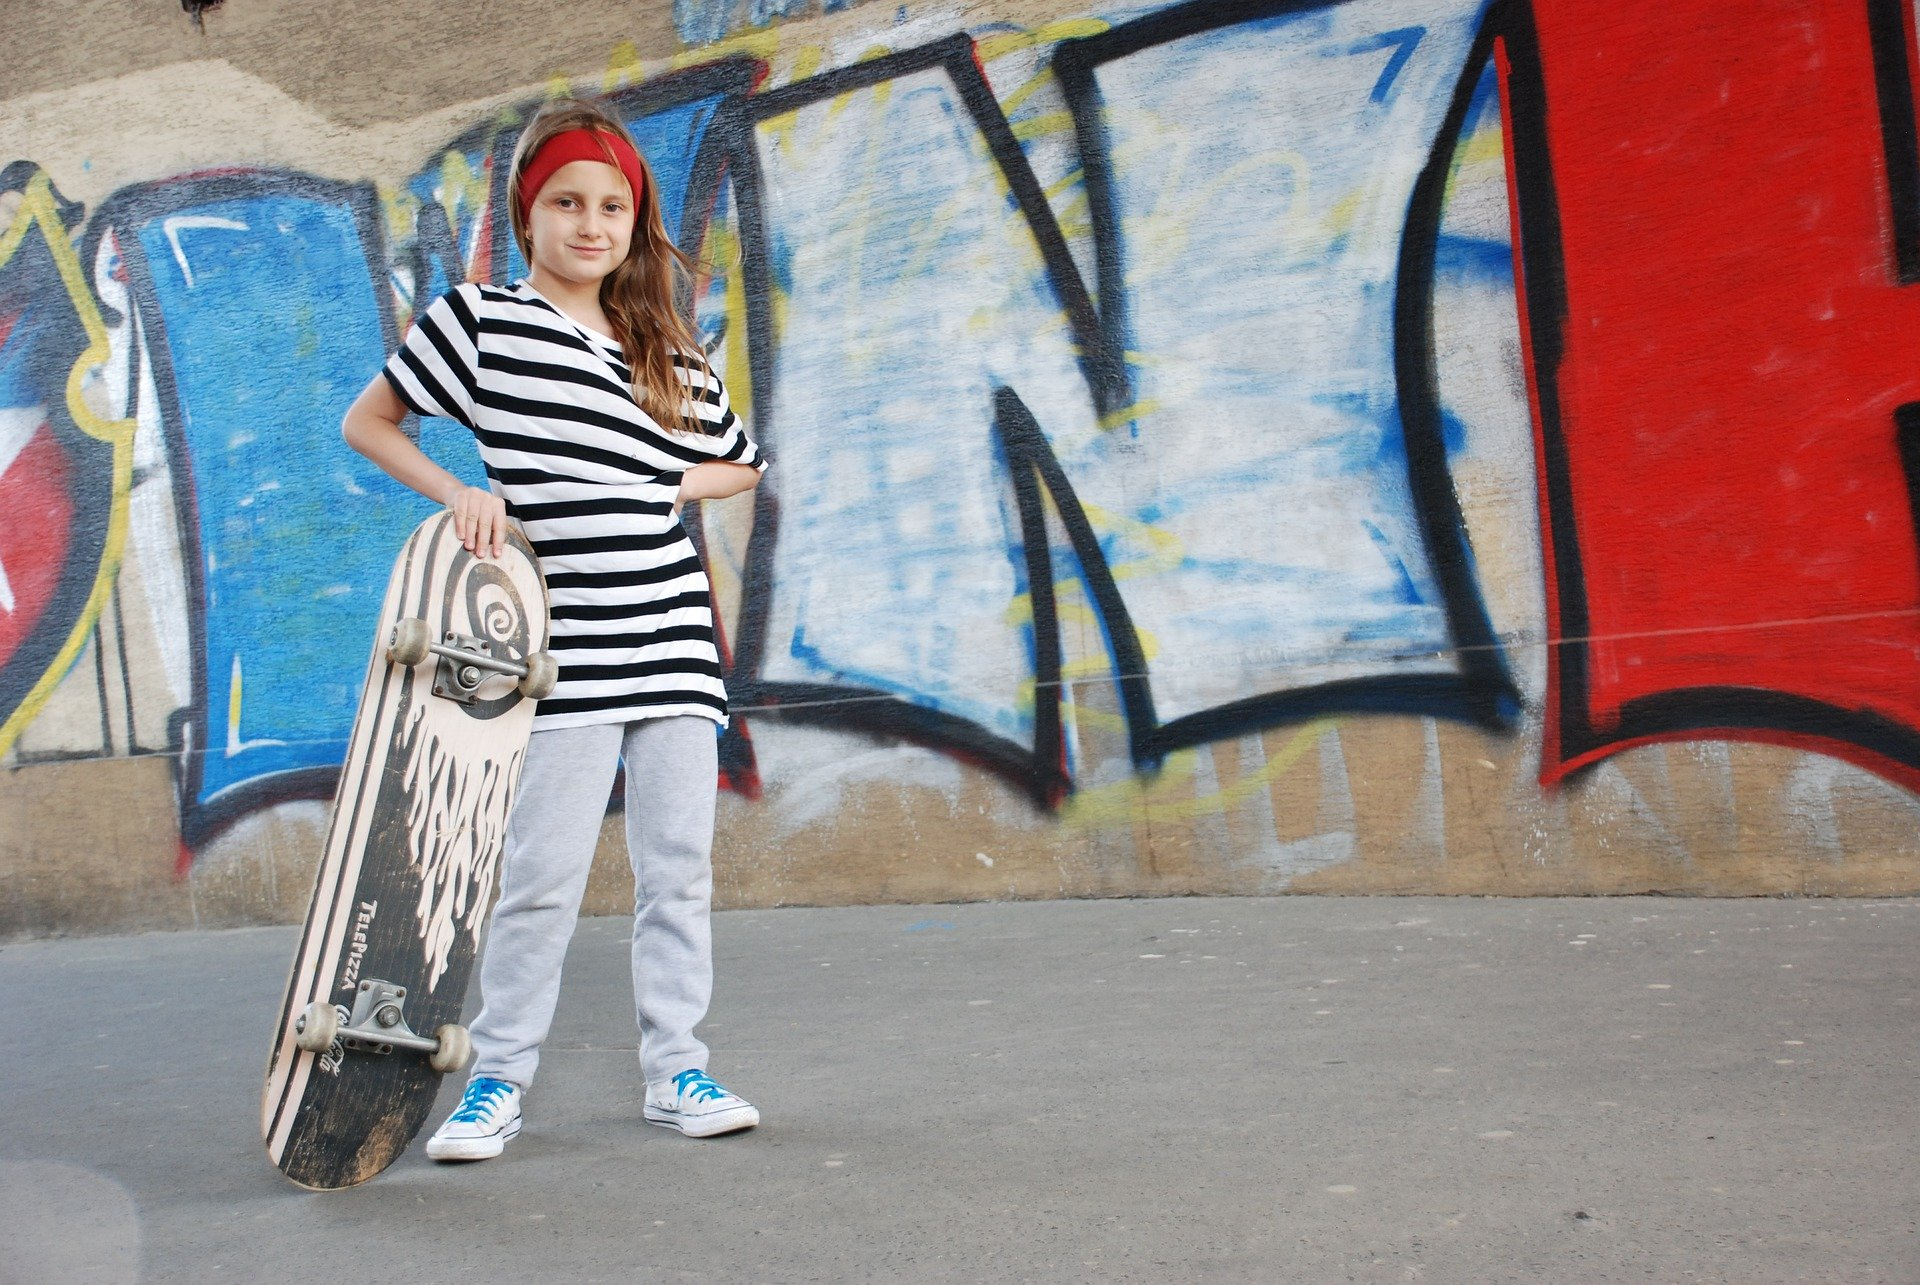 actividades extraescolares madrid skateboard